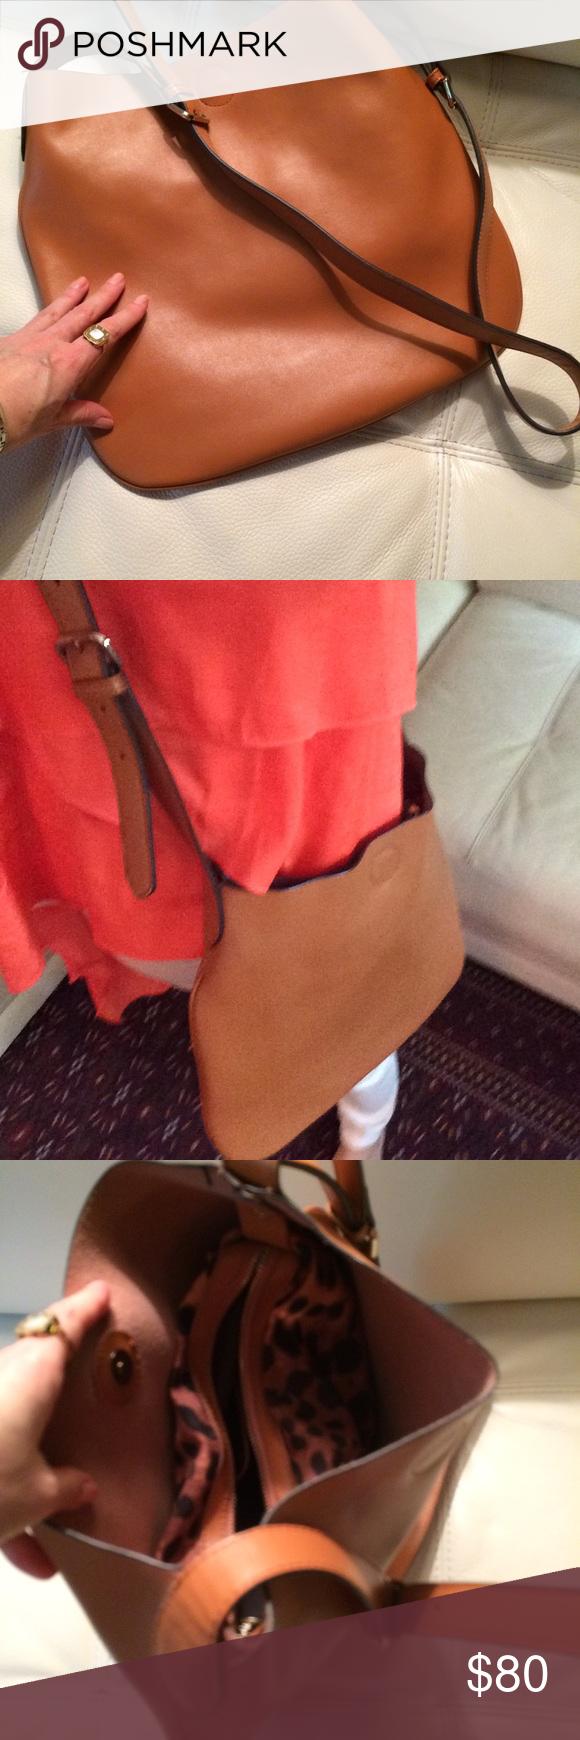 Sale‼️‼️‼️Tan leather cross body bag Tan leather cross body bag. Real leather.  Measurement: 14X 14 inches Bags Crossbody Bags